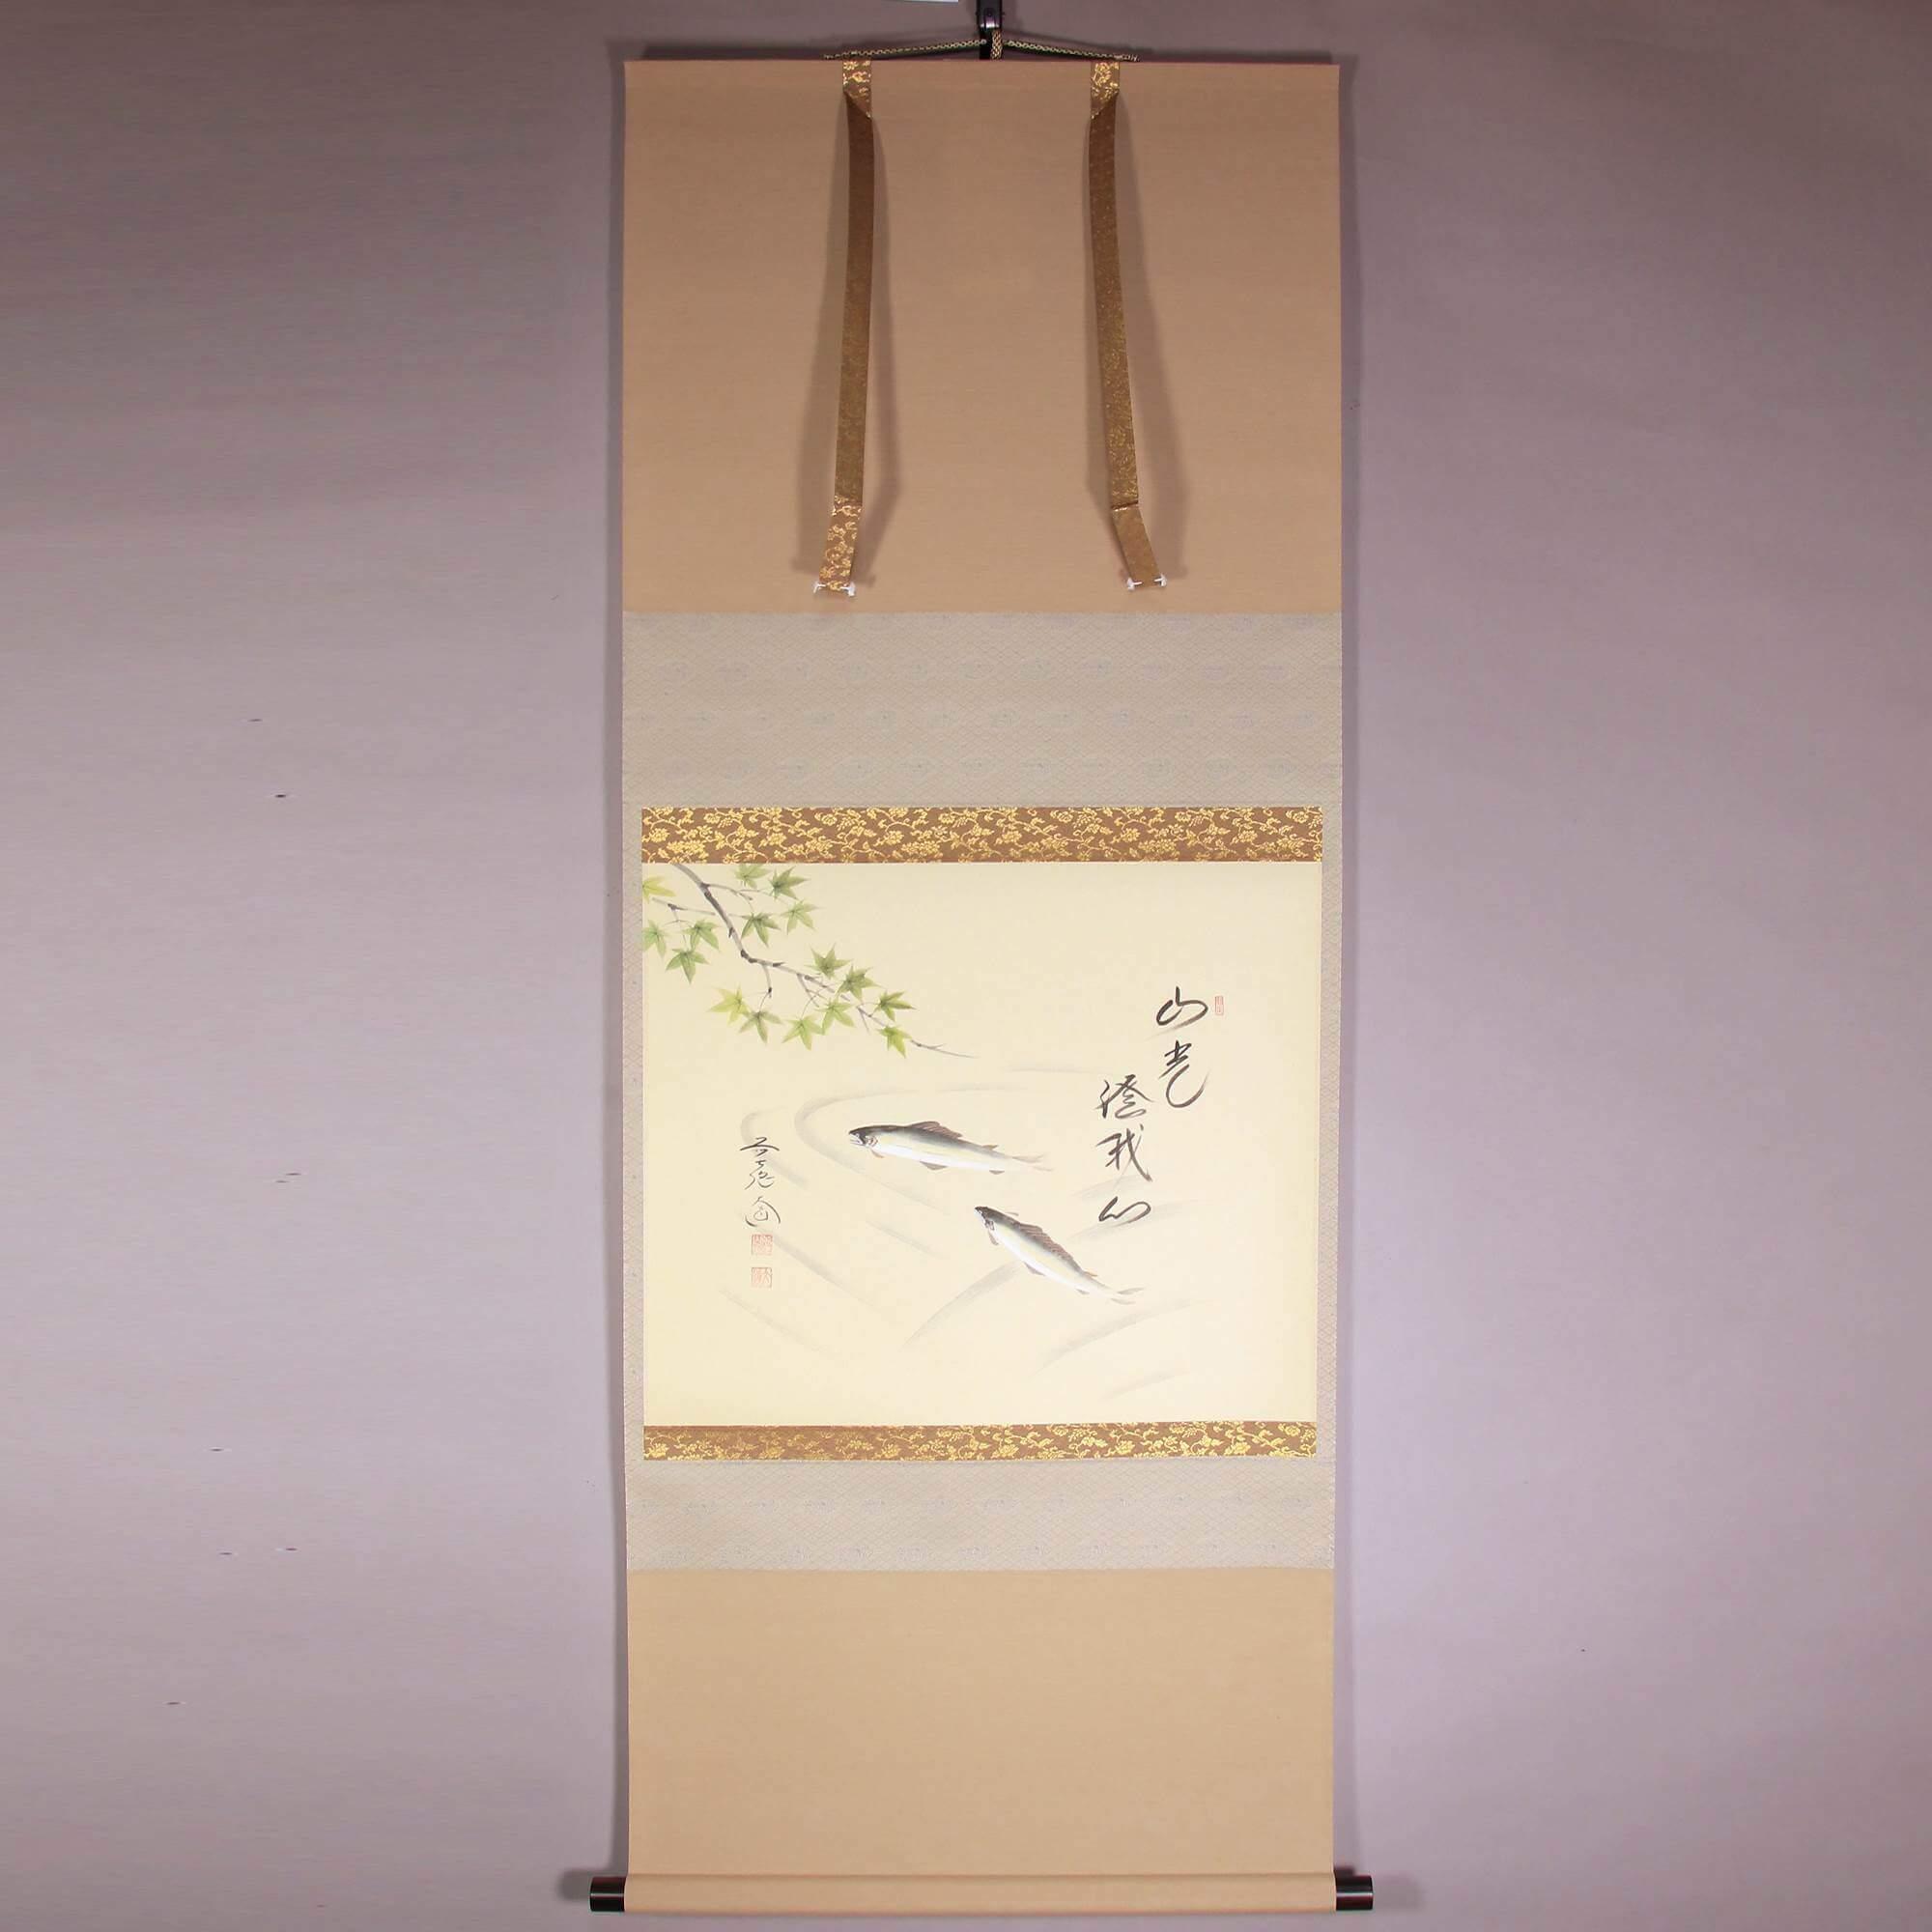 Maples and Ayu Sweetfish / Daidou Nishigaki